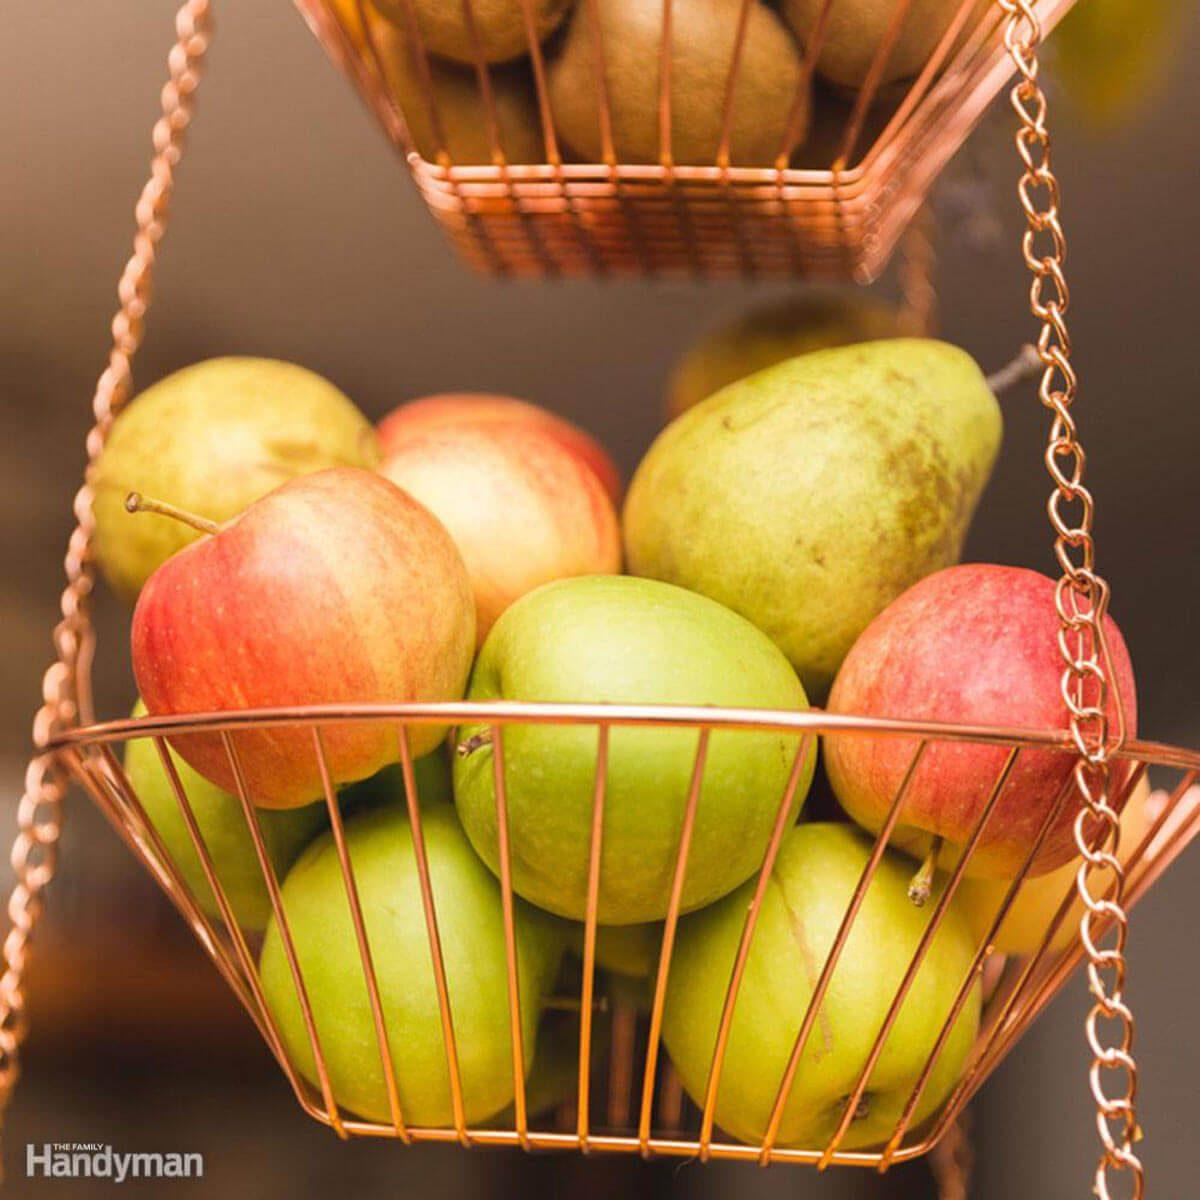 Better in a Basket